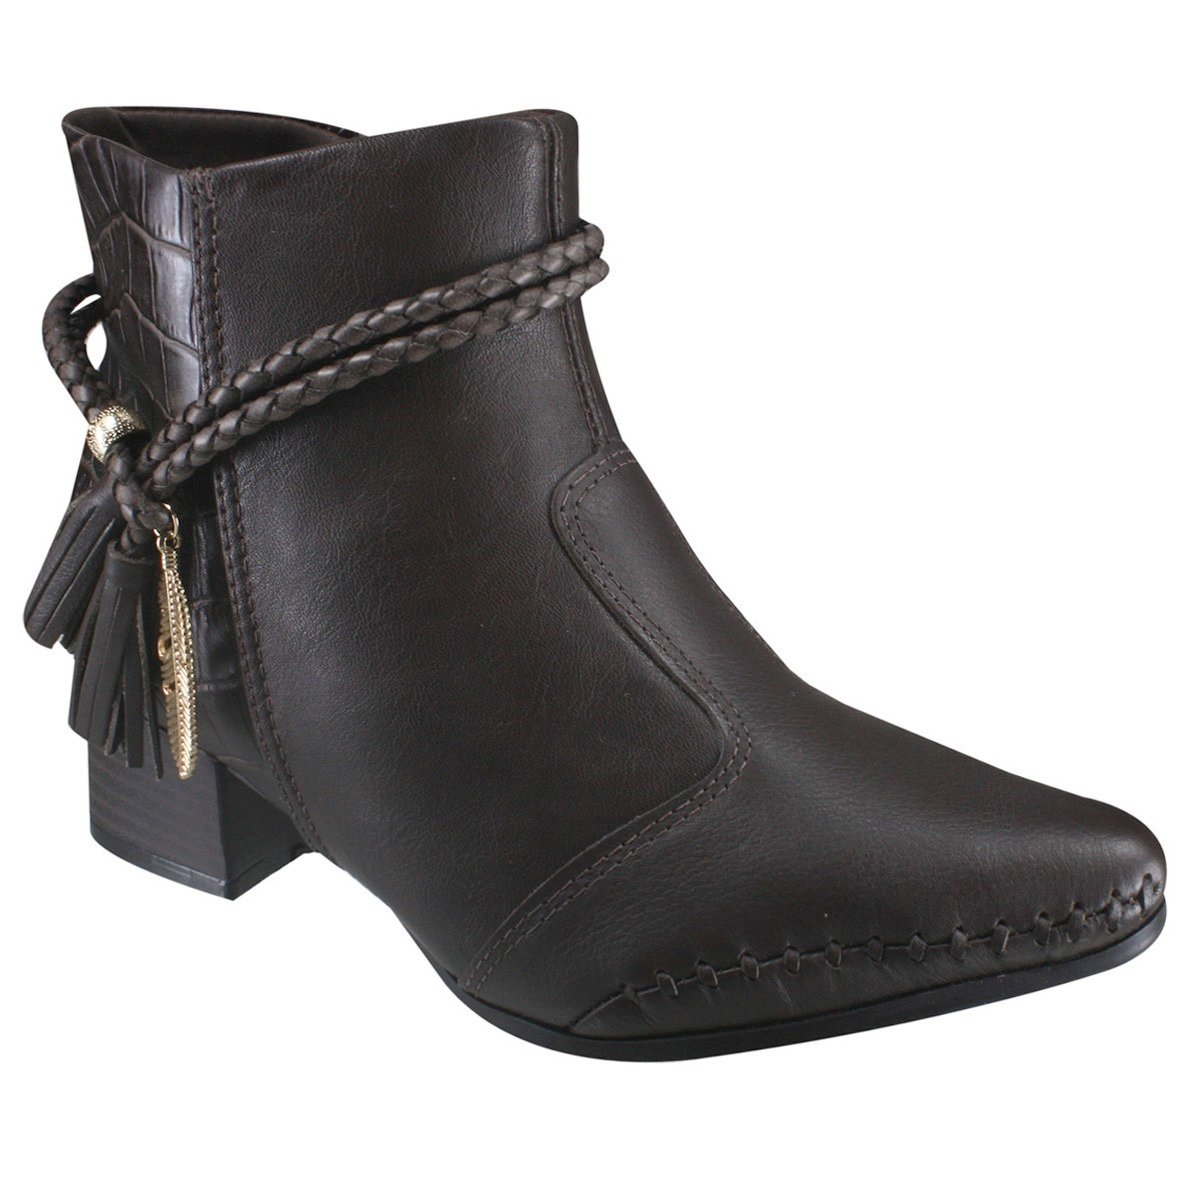 728553d048aa Bota Ankle Boot Ramarim Total Comfort 17-57102 0001 Cacau (Naturale  Soft Plus